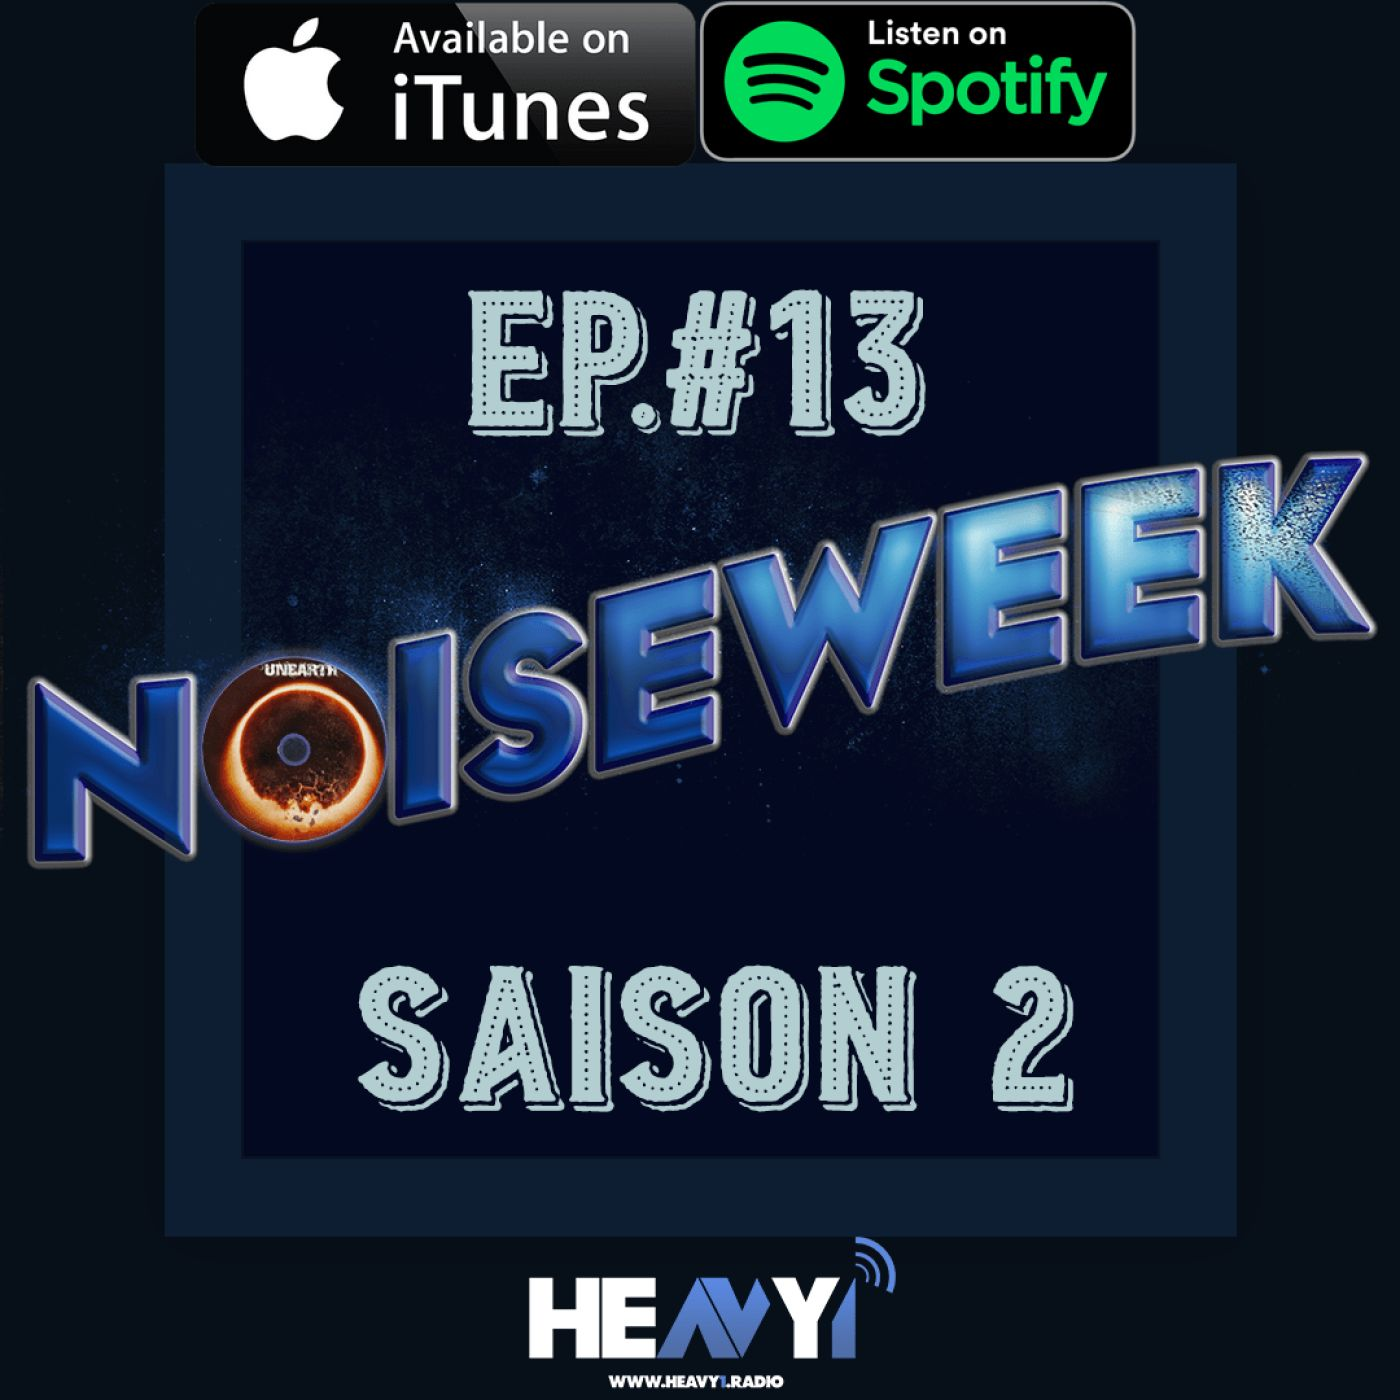 Noiseweek #13 Saison 2